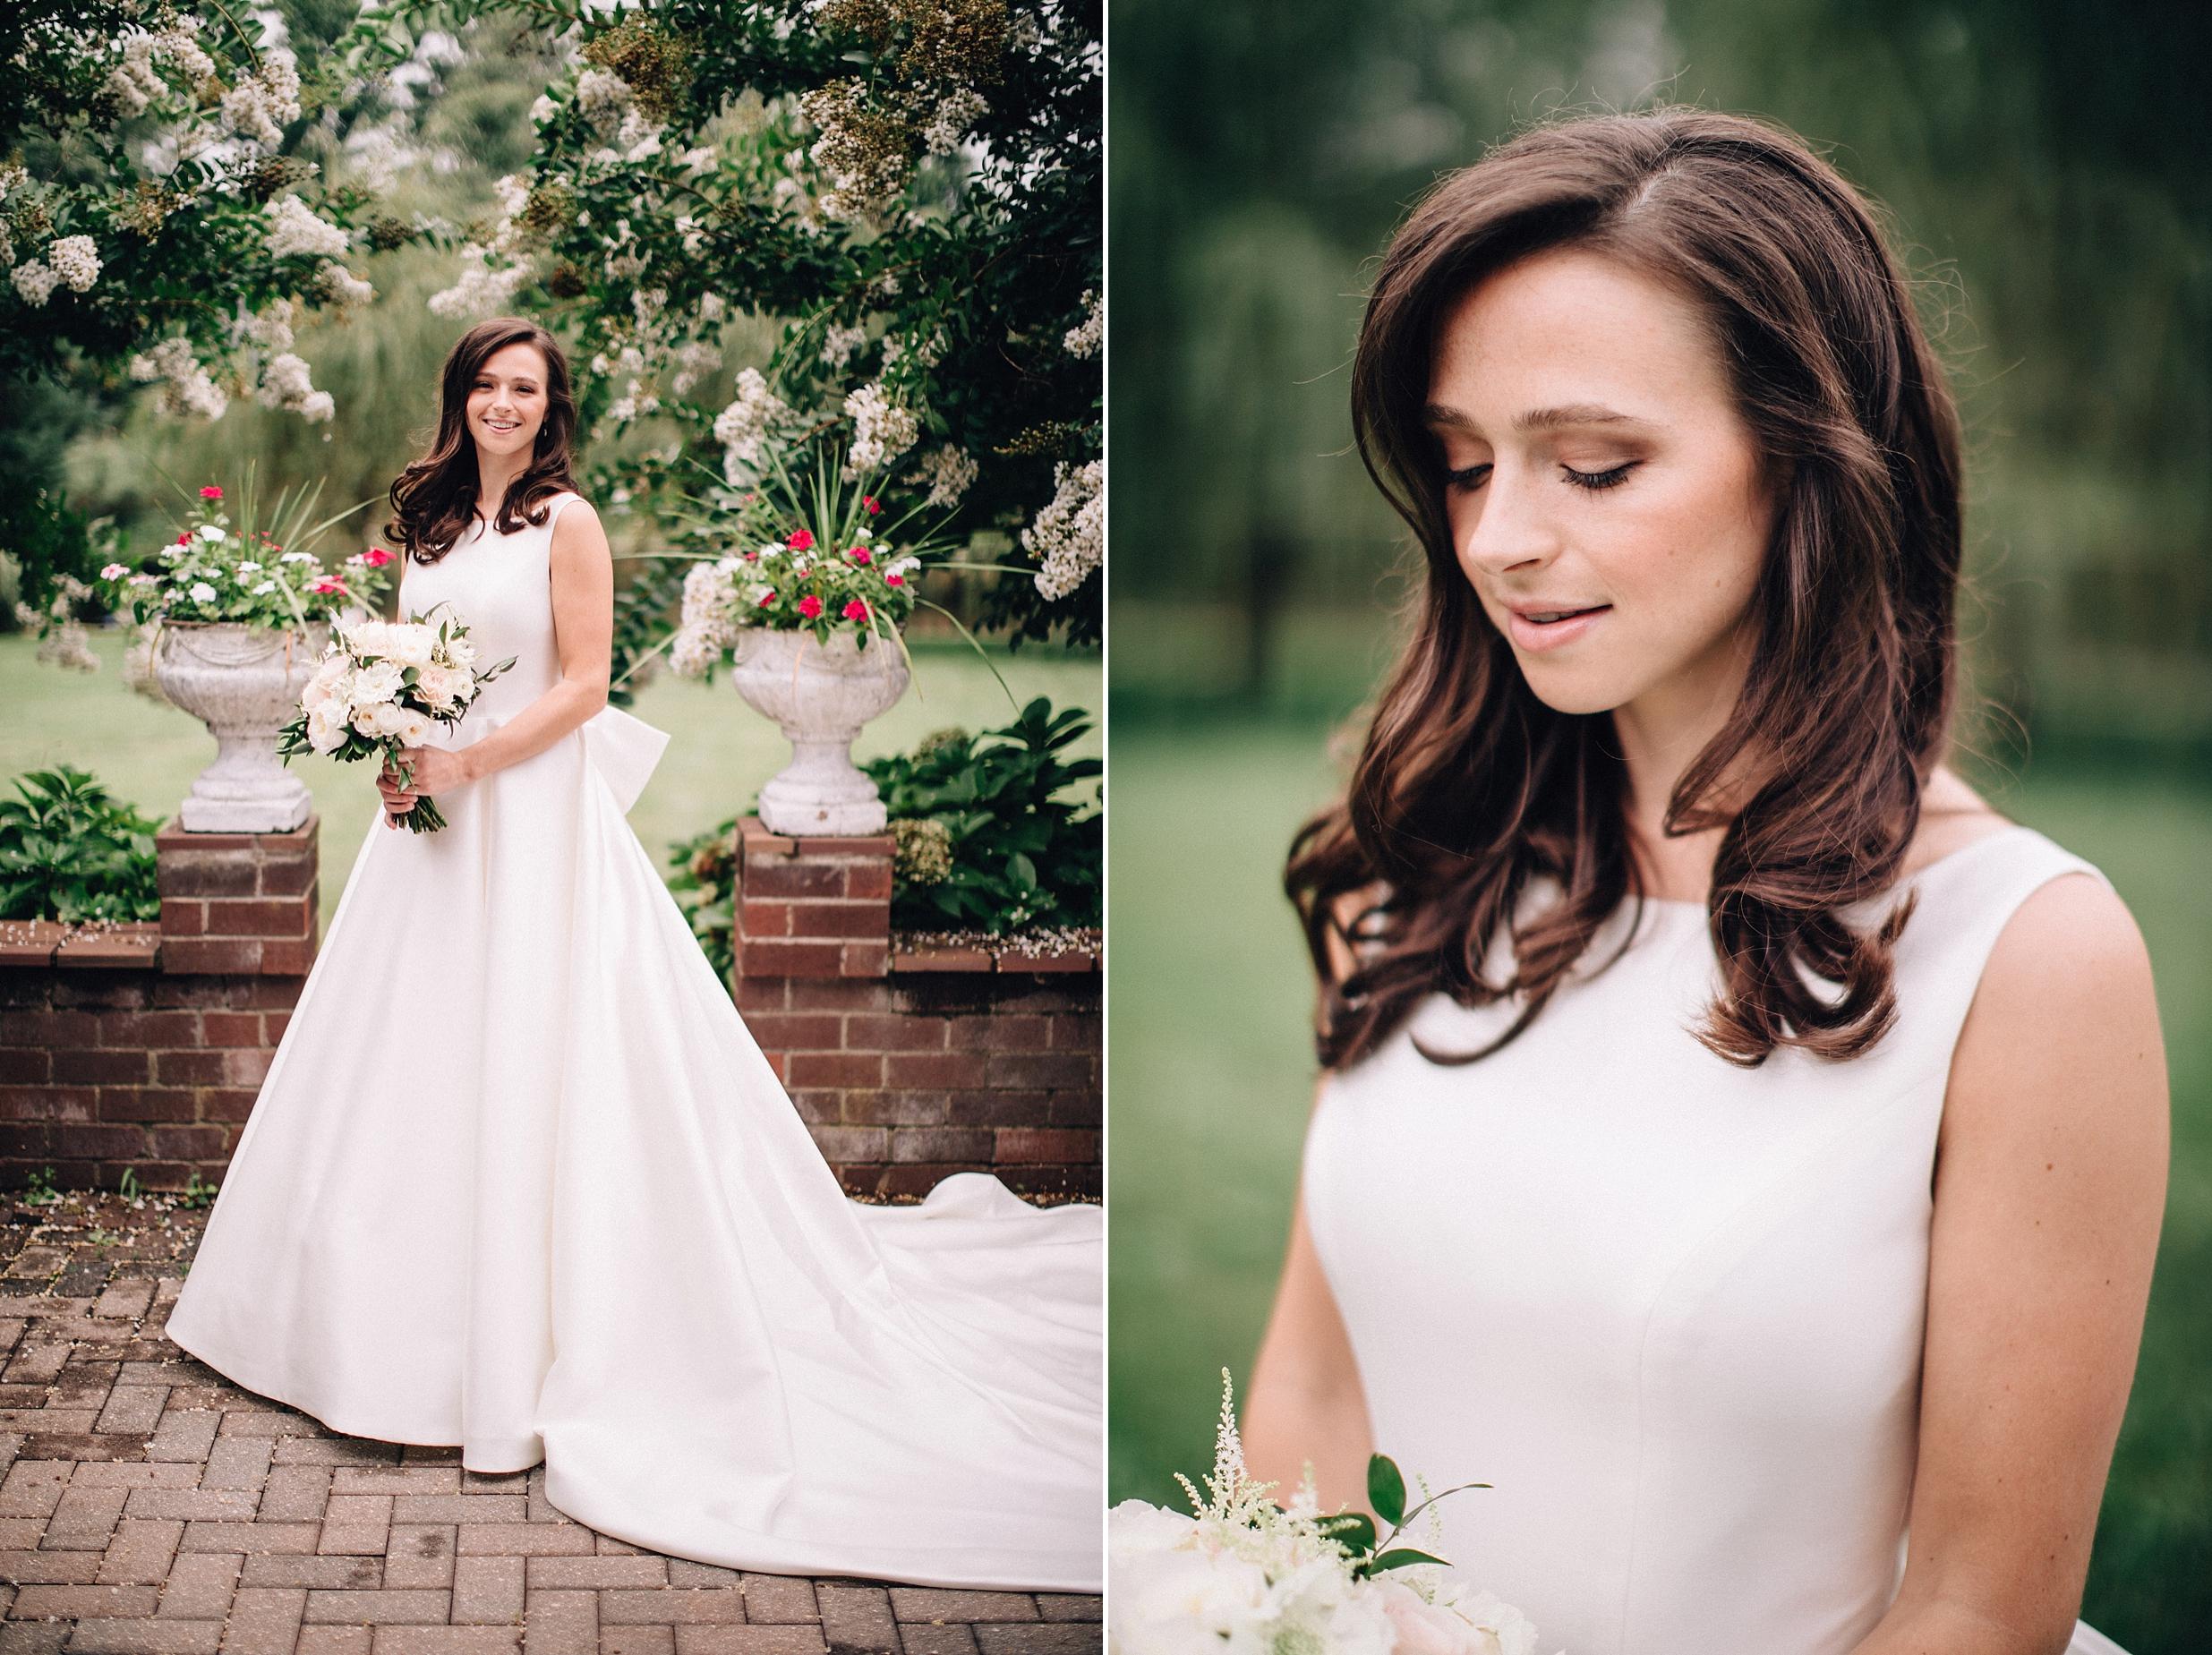 rumson-tented-wedding-nj-maine-conneticut-classic_0013.jpg